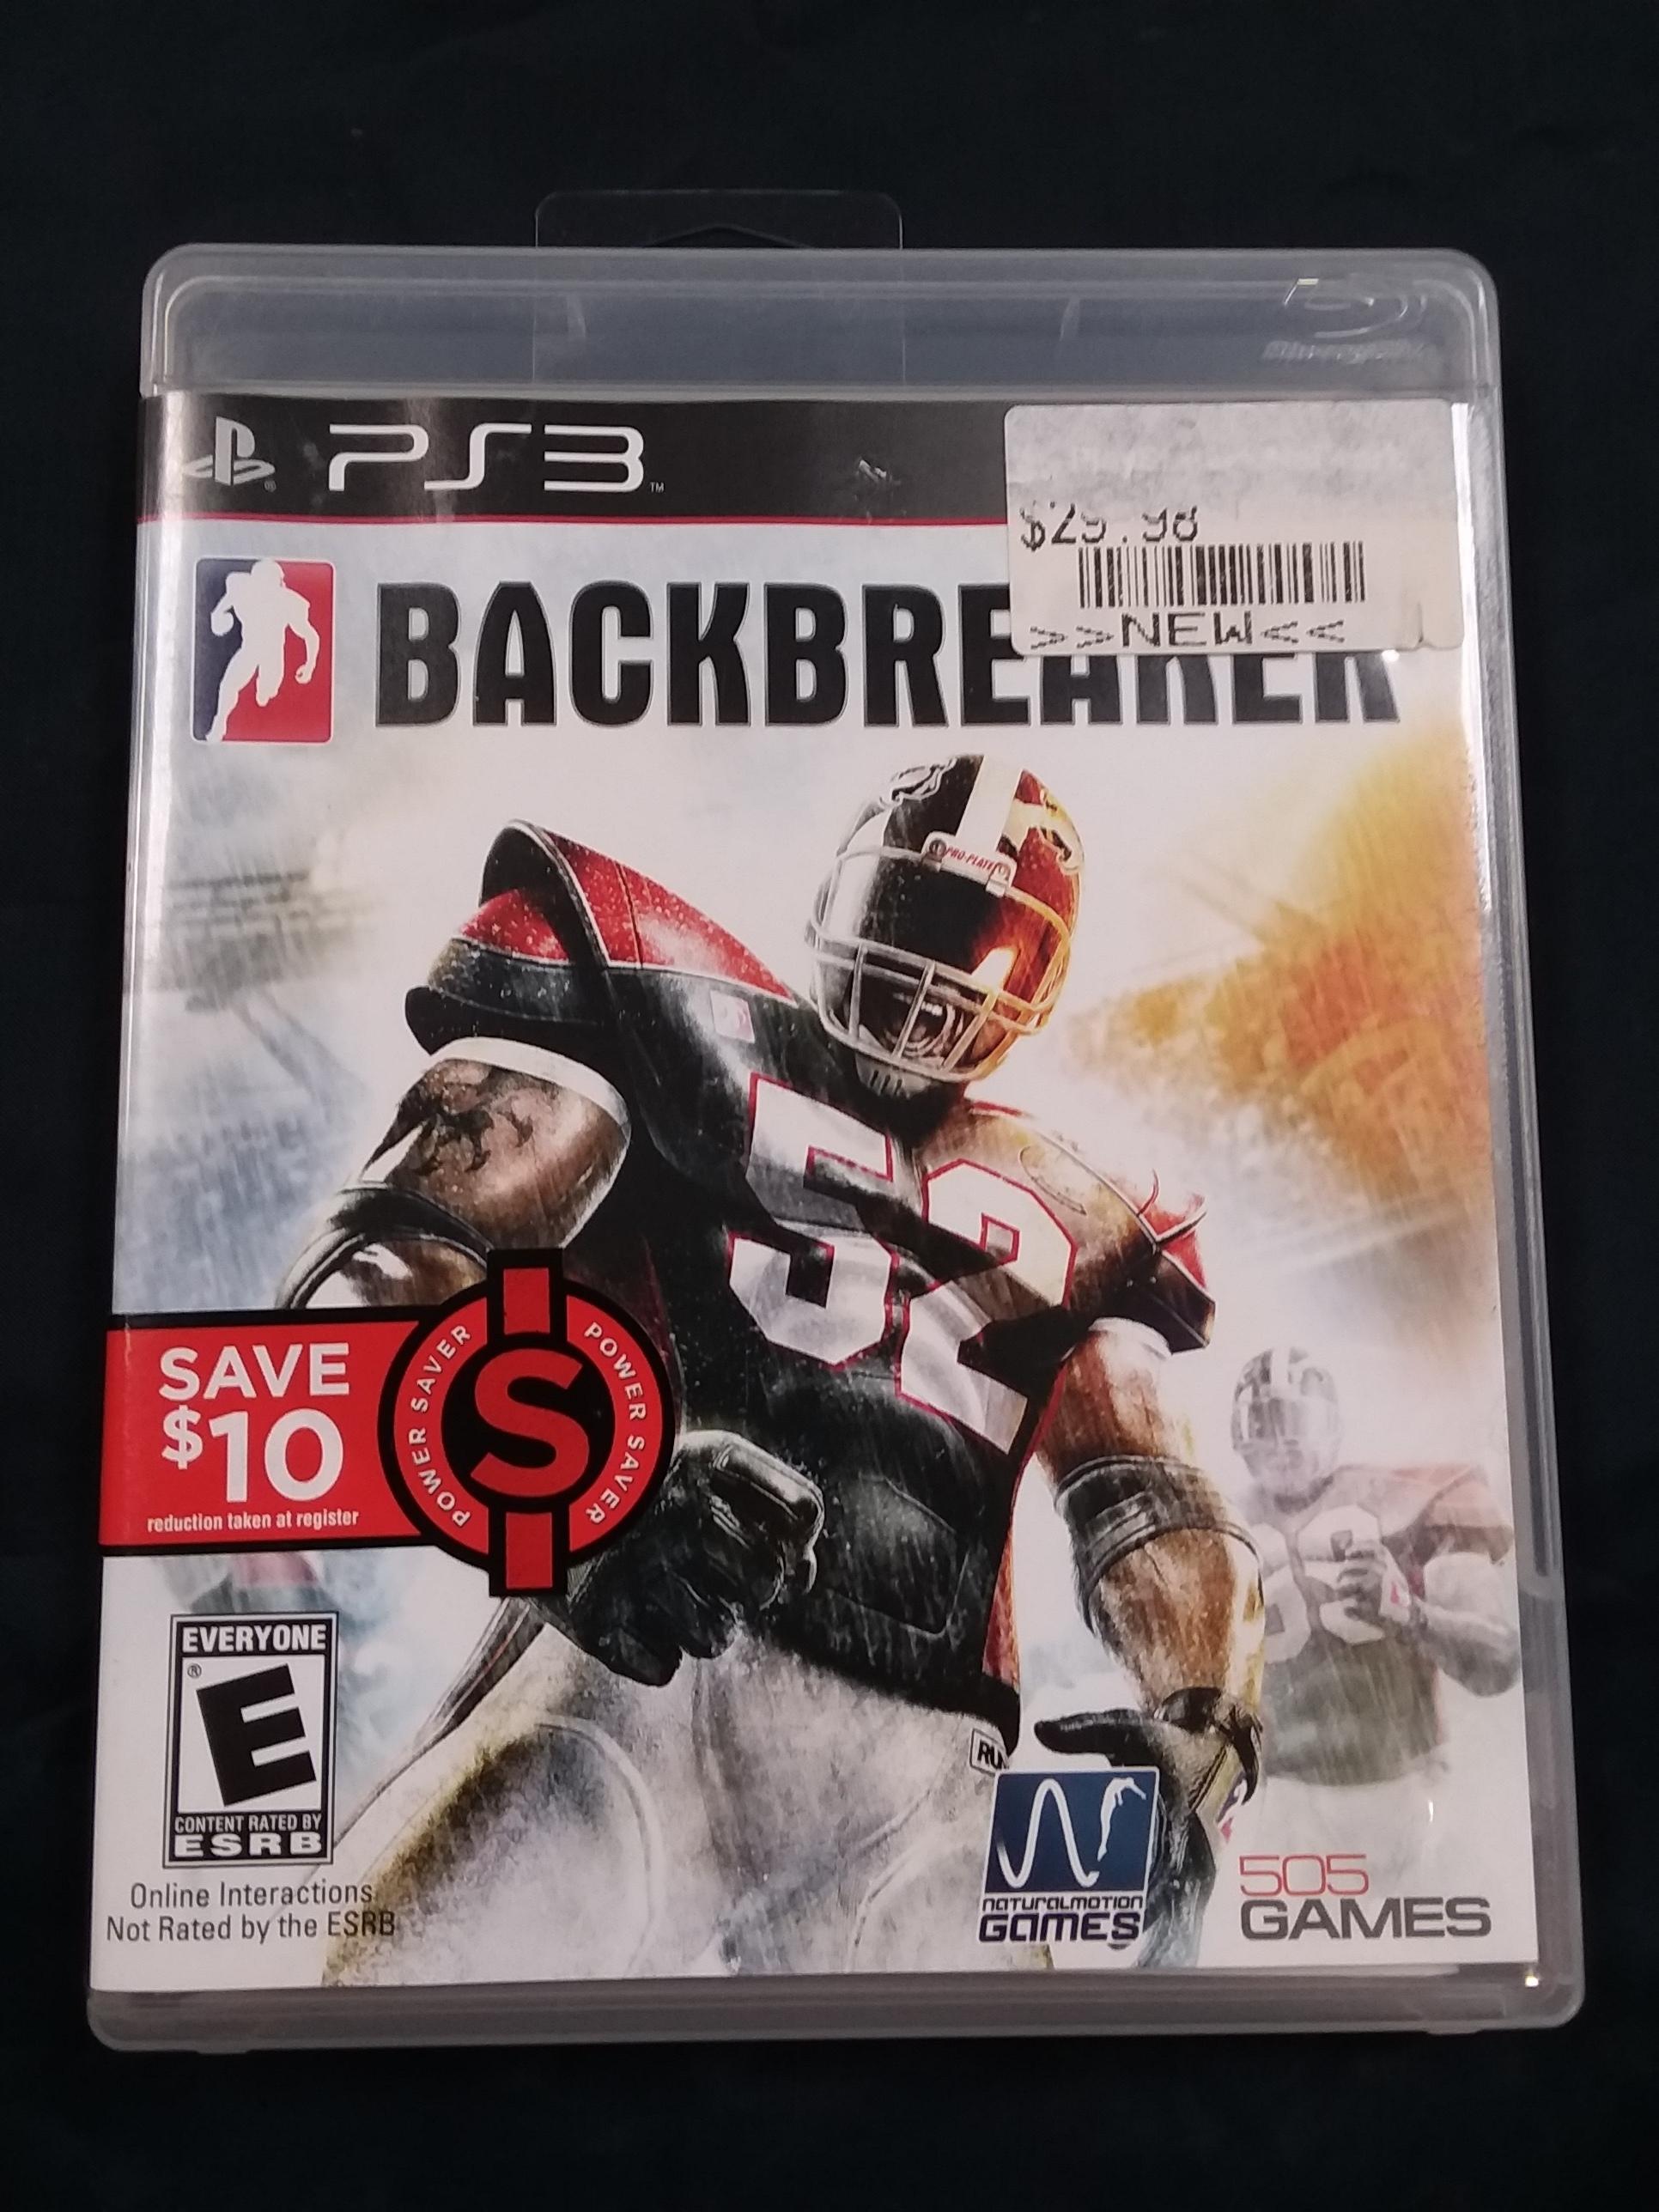 GAMES: PS3 GAME - BACKBREAKER